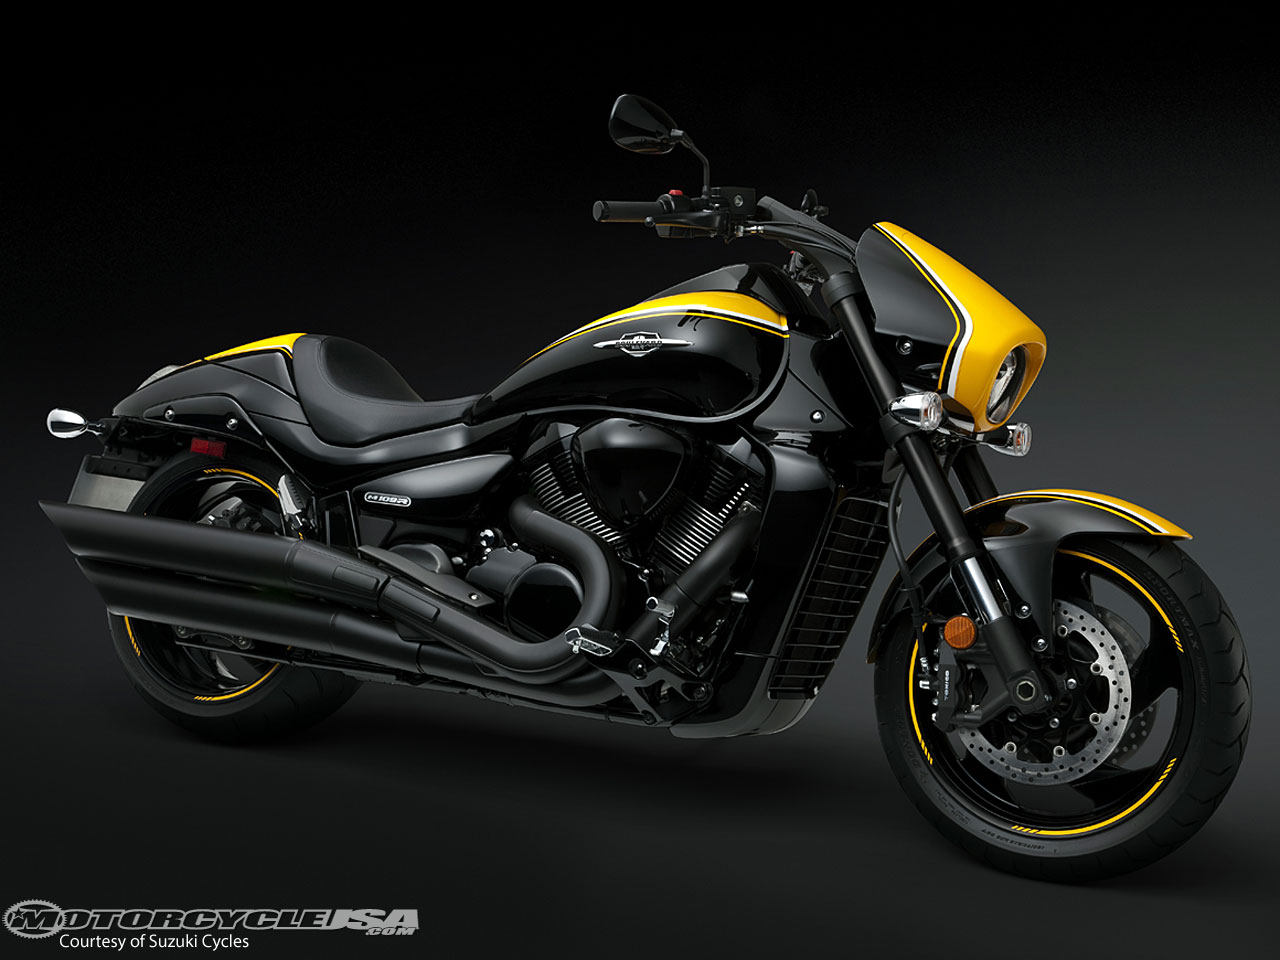 [Nova Moto] Suzuki Boulevard M1500 - clatyler 2014-Suzuki-BOSS-M109R